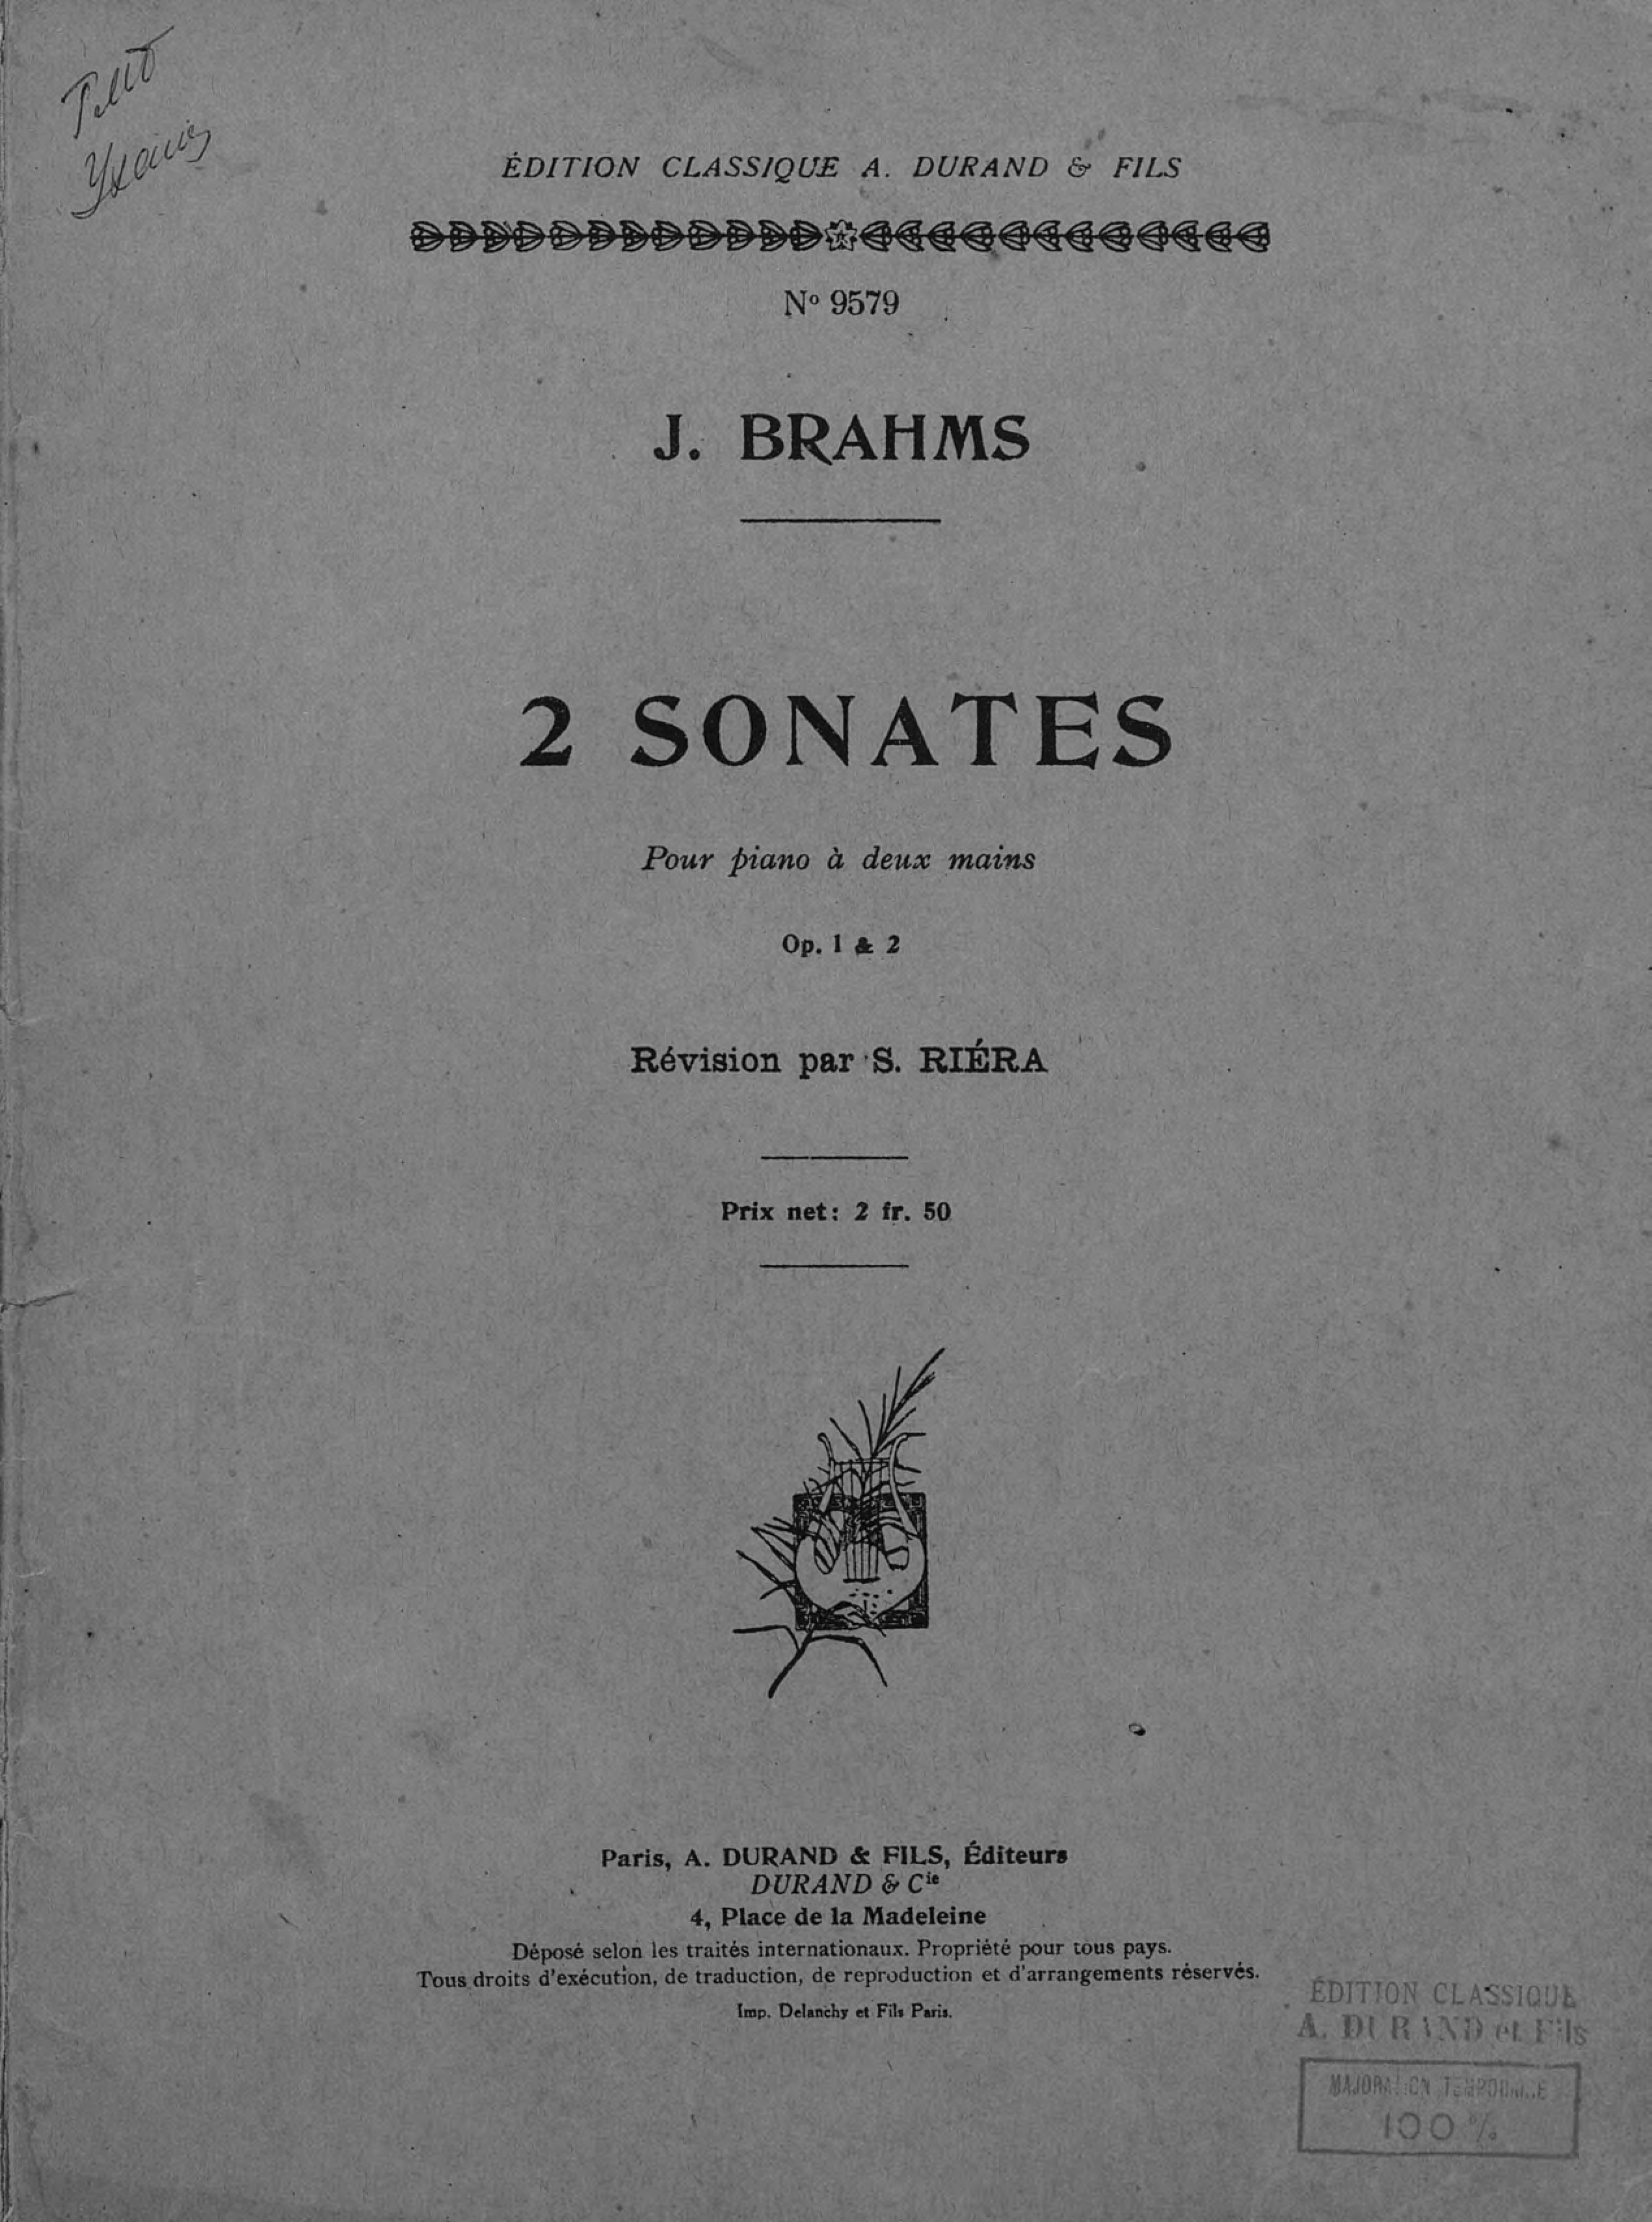 Иоганнес Брамс 2 Sonates various boccherini luigi sonates